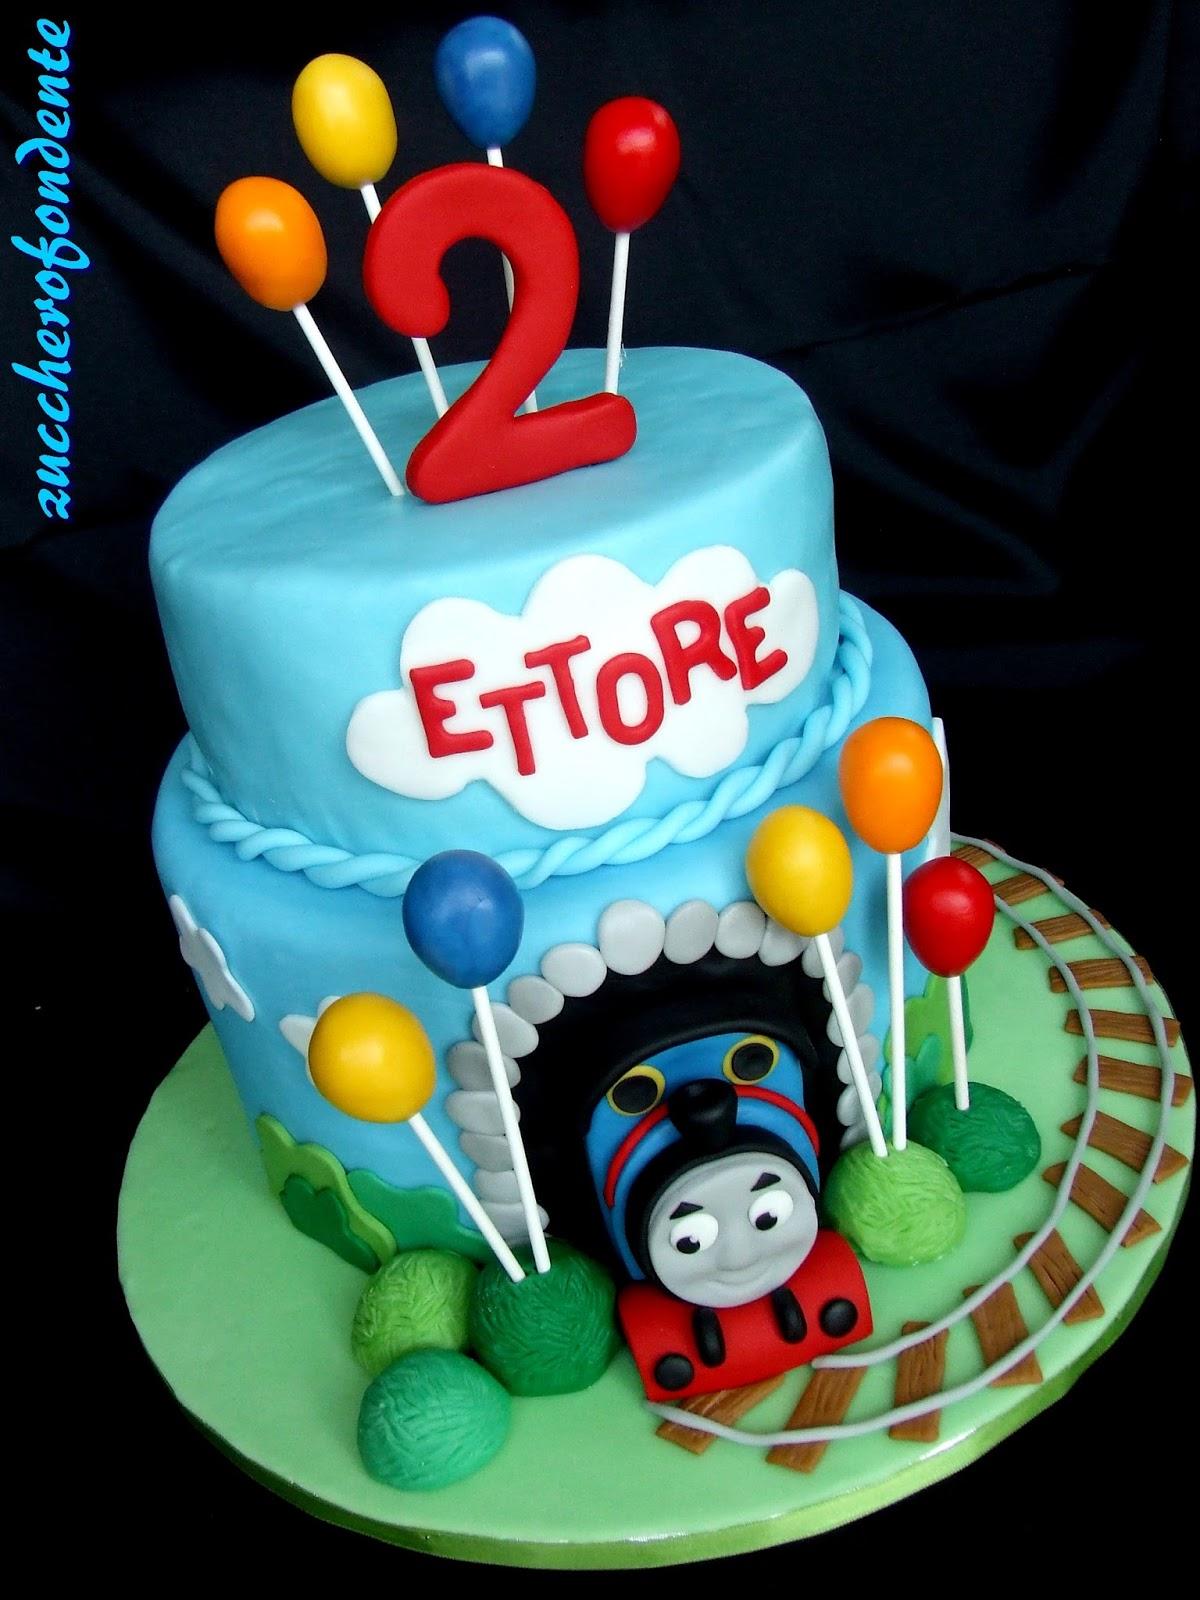 Torta trenino thomas 10 spunti creativi in pdz o cialda for Decorazioni torte trenino thomas